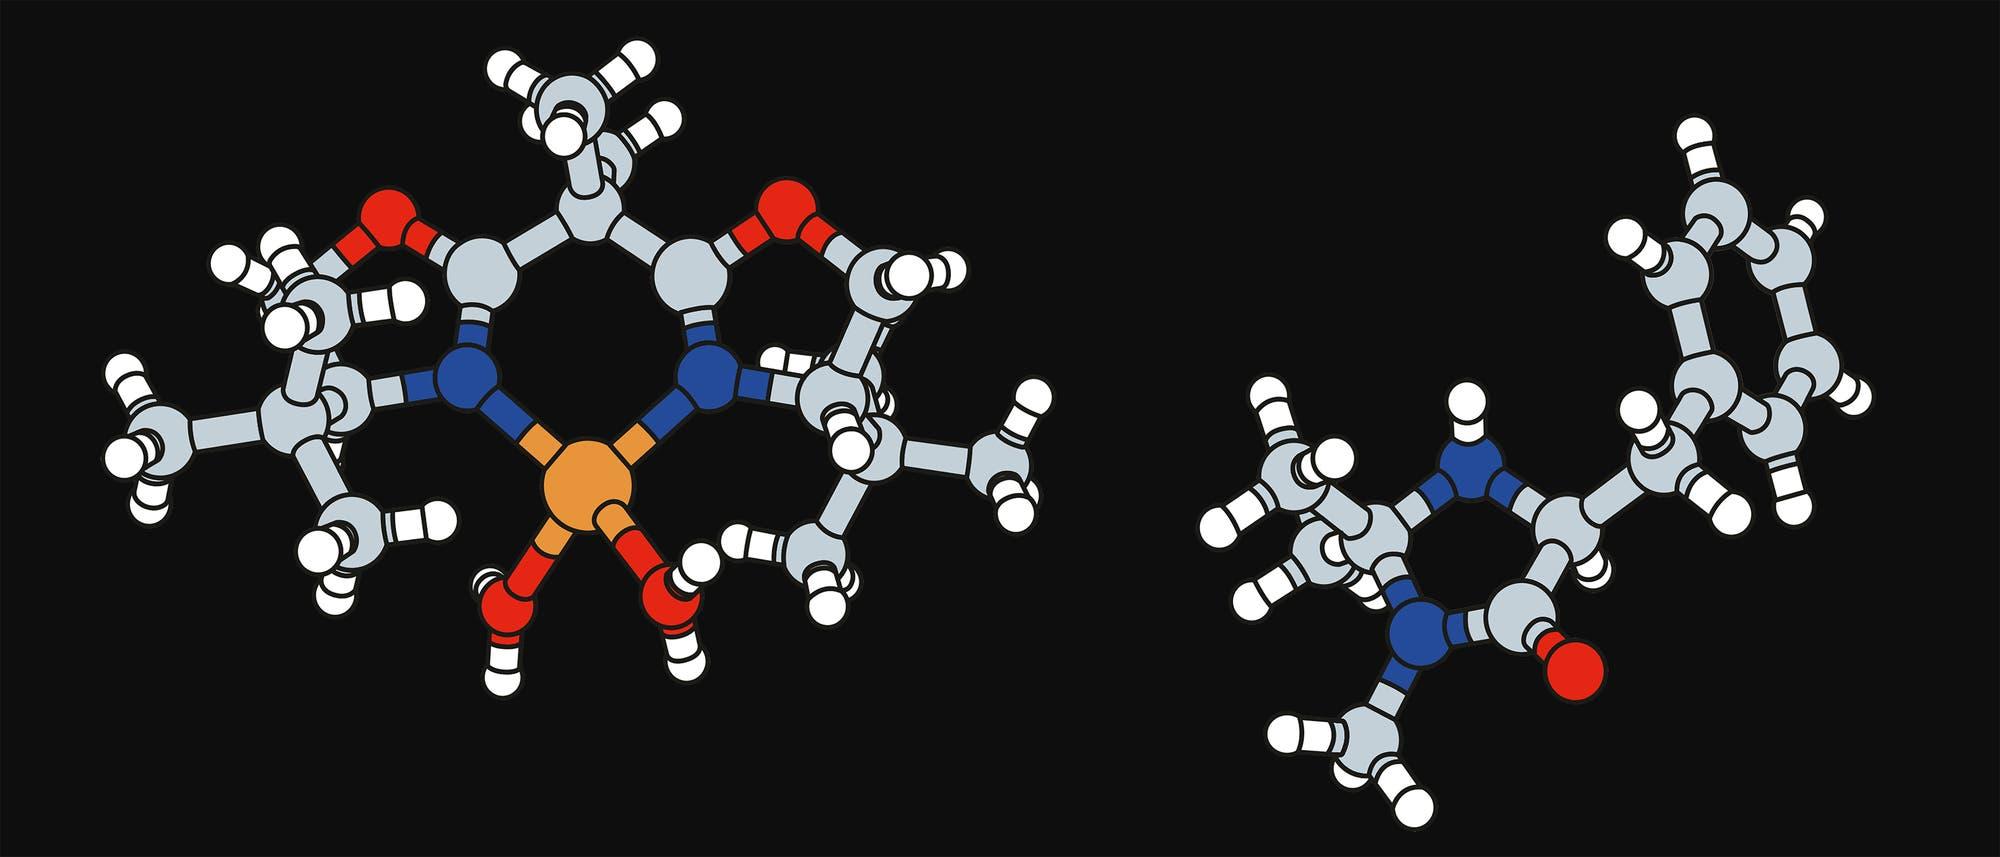 Katalysatoren für Metathese. Links: klassischer Metallkatalysator. Rechts: Organokatalysator.